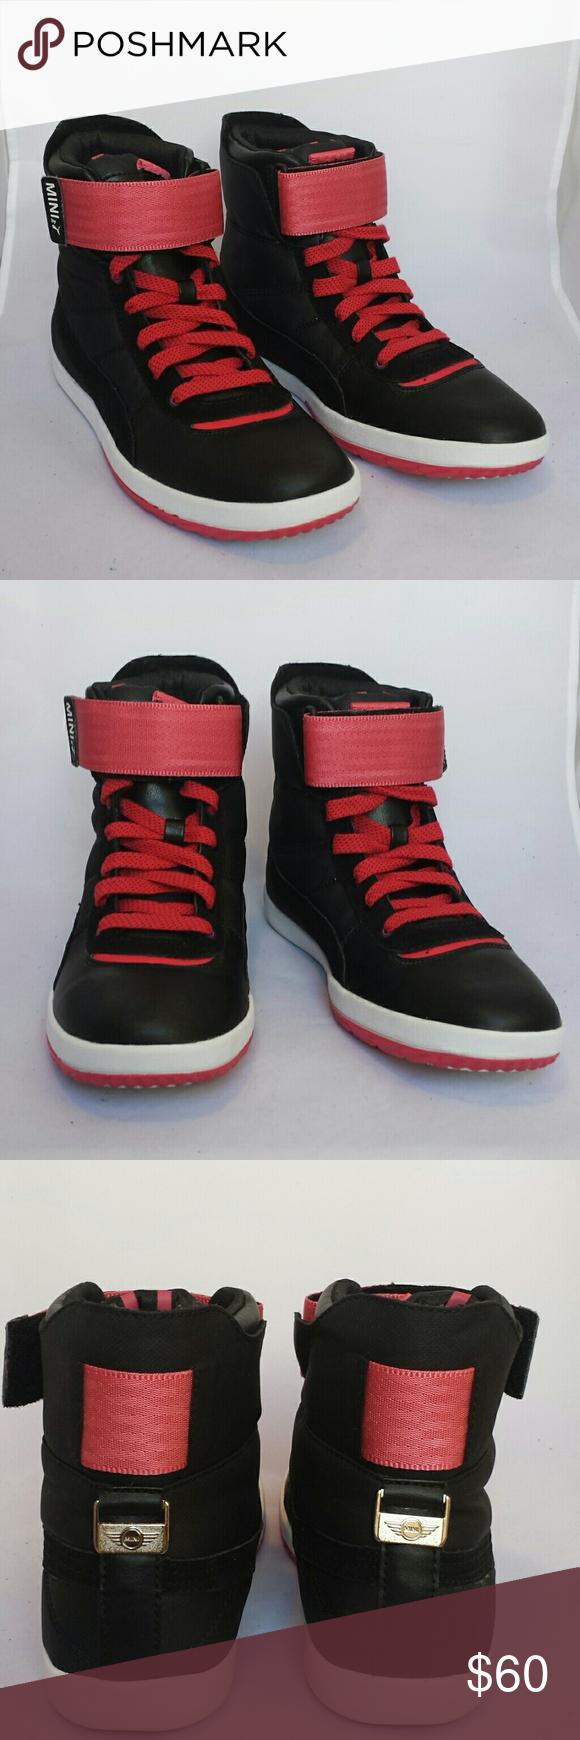 4fb3952f124 Puma  Celerity  MINI Inspired Hi-High Sneakers These cute hi-tops are